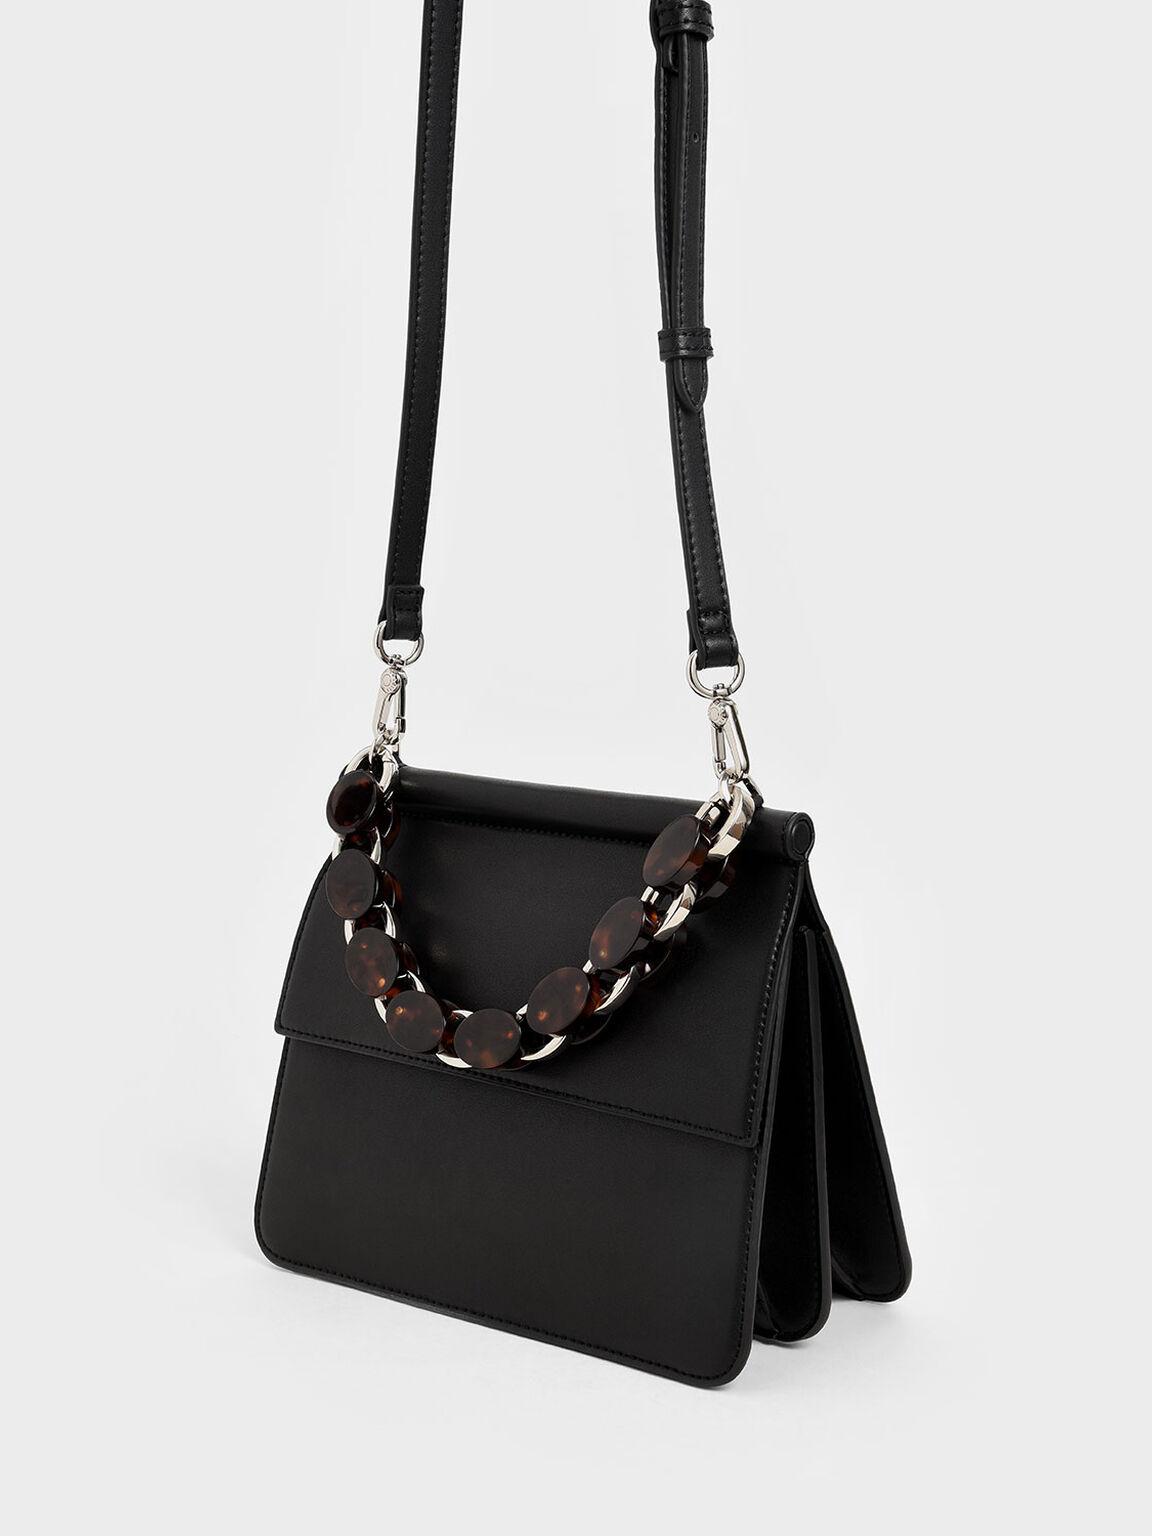 Acrylic Tortoiseshell Top Handle Bag, Black, hi-res